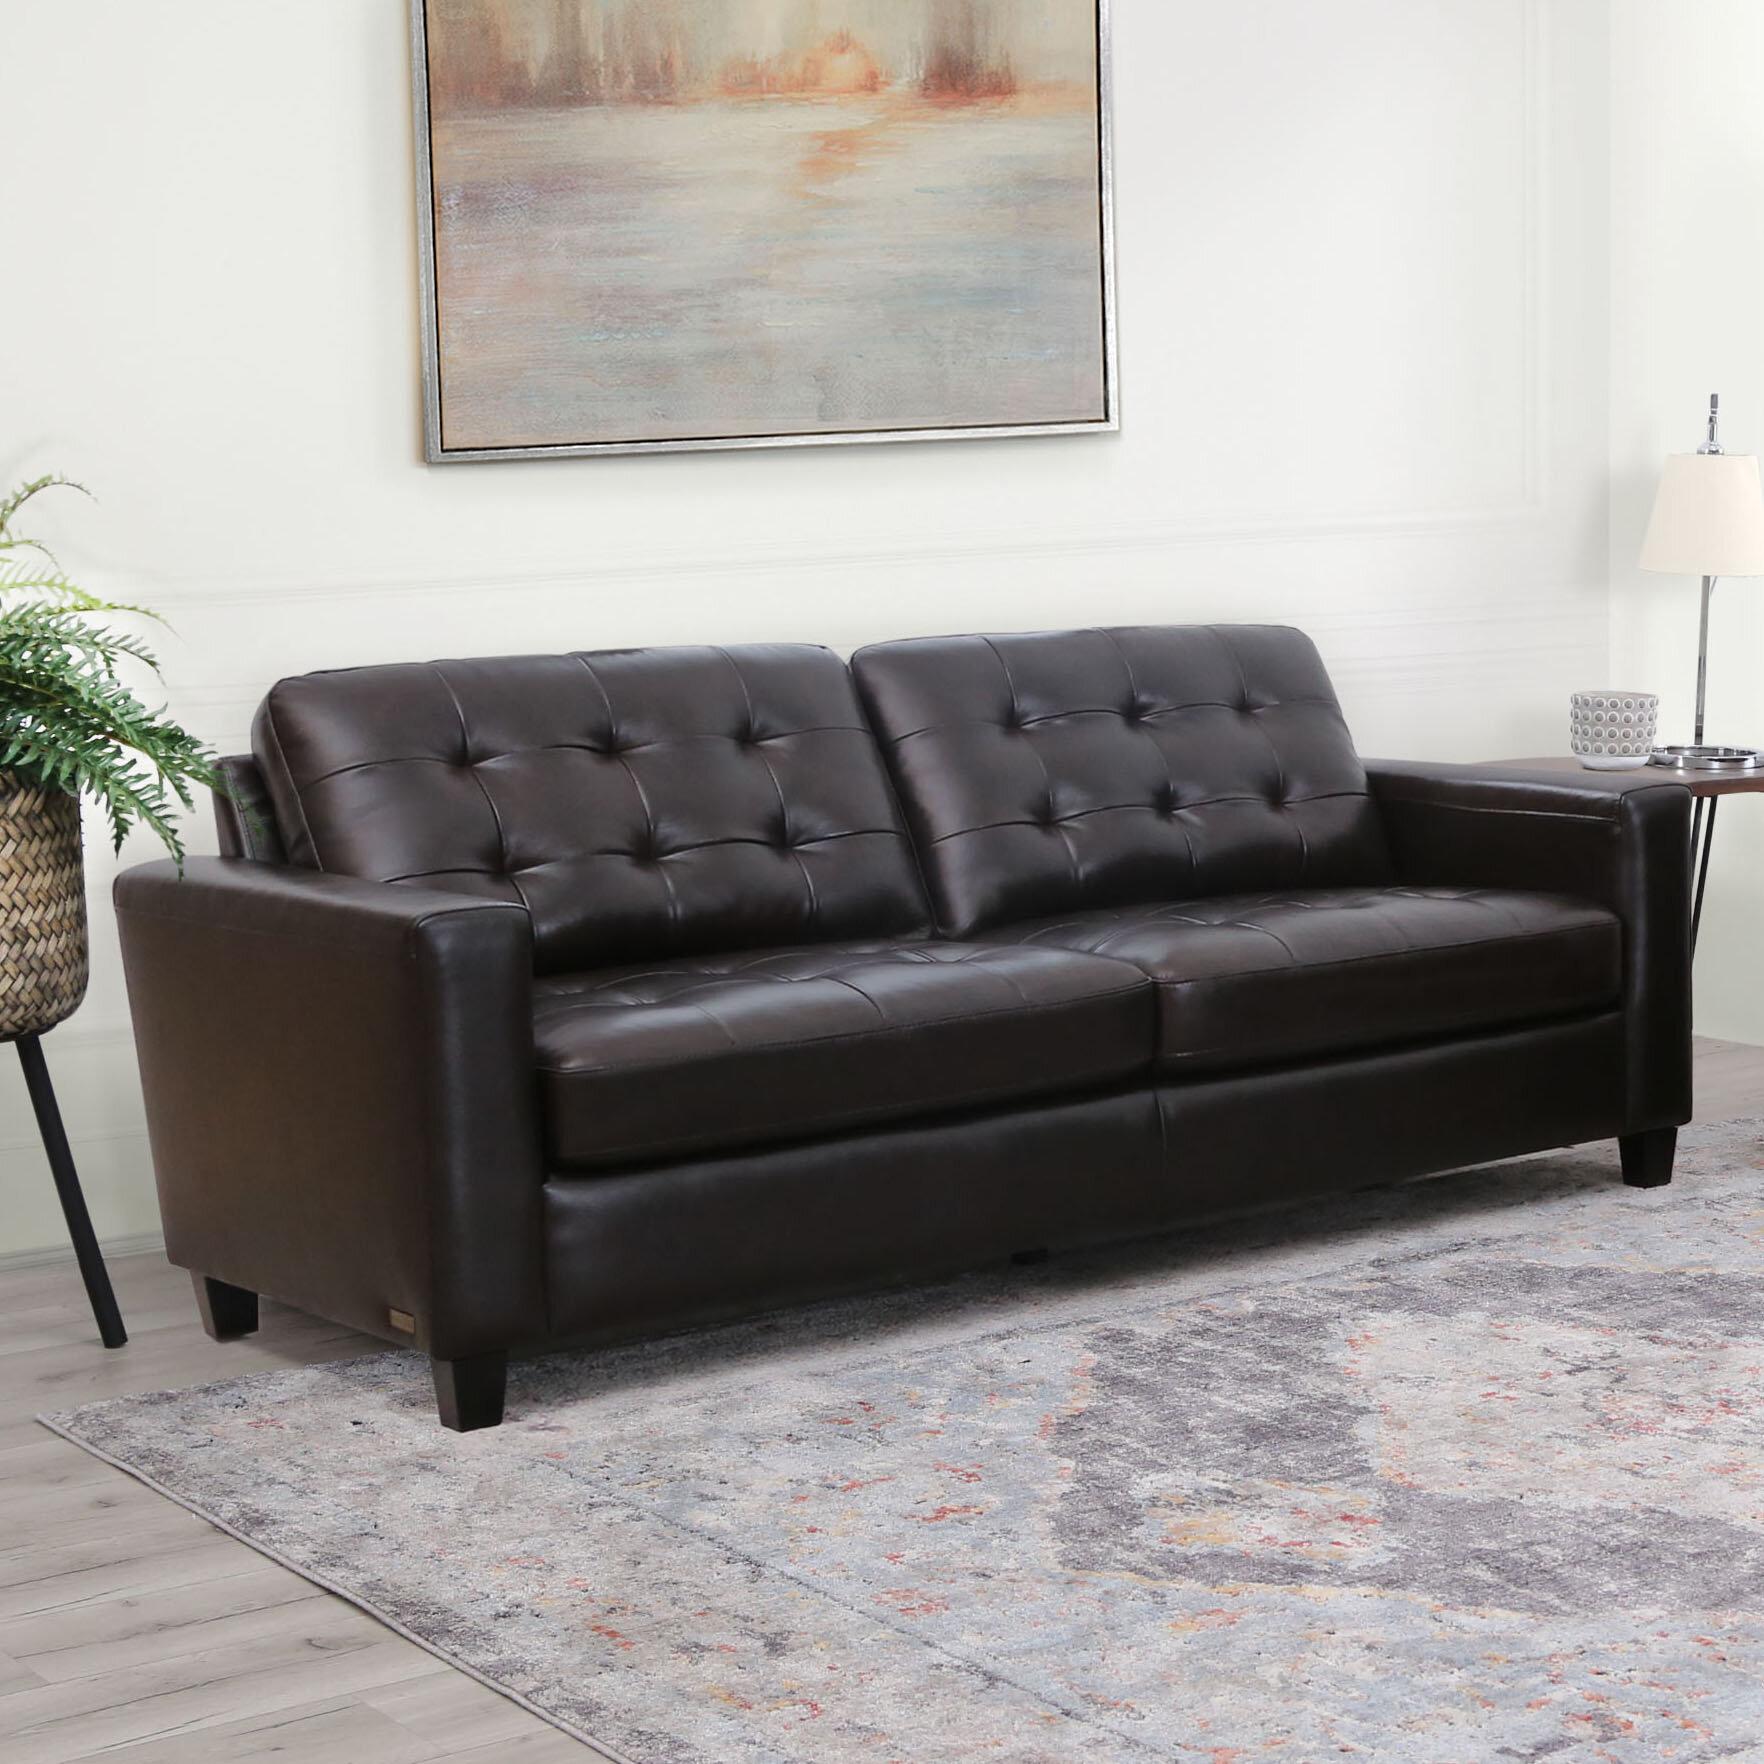 Enjoyable Dion Genuine Leather Sofa Interior Design Ideas Clesiryabchikinfo